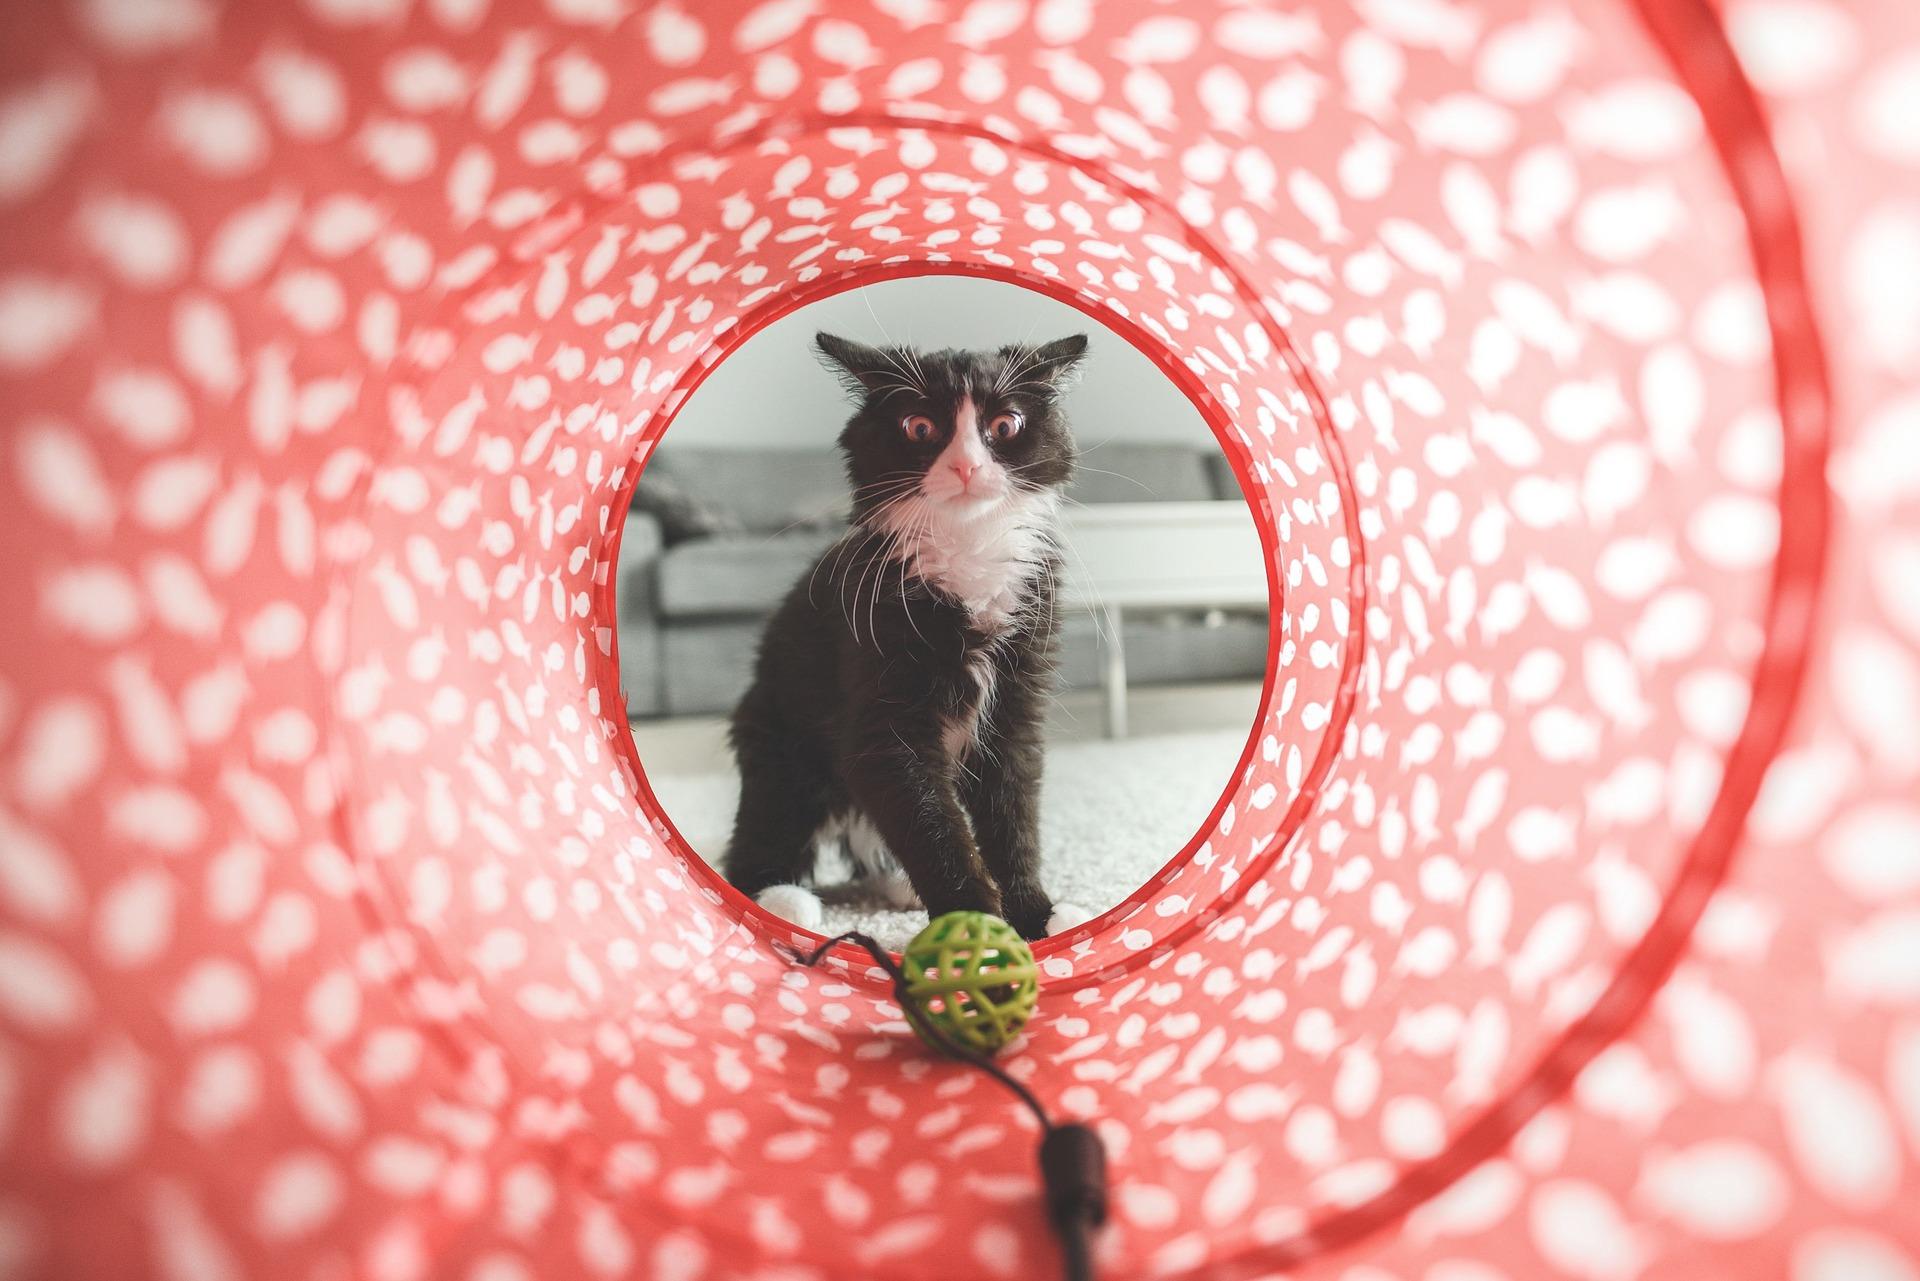 cat-932846_1920.jpg